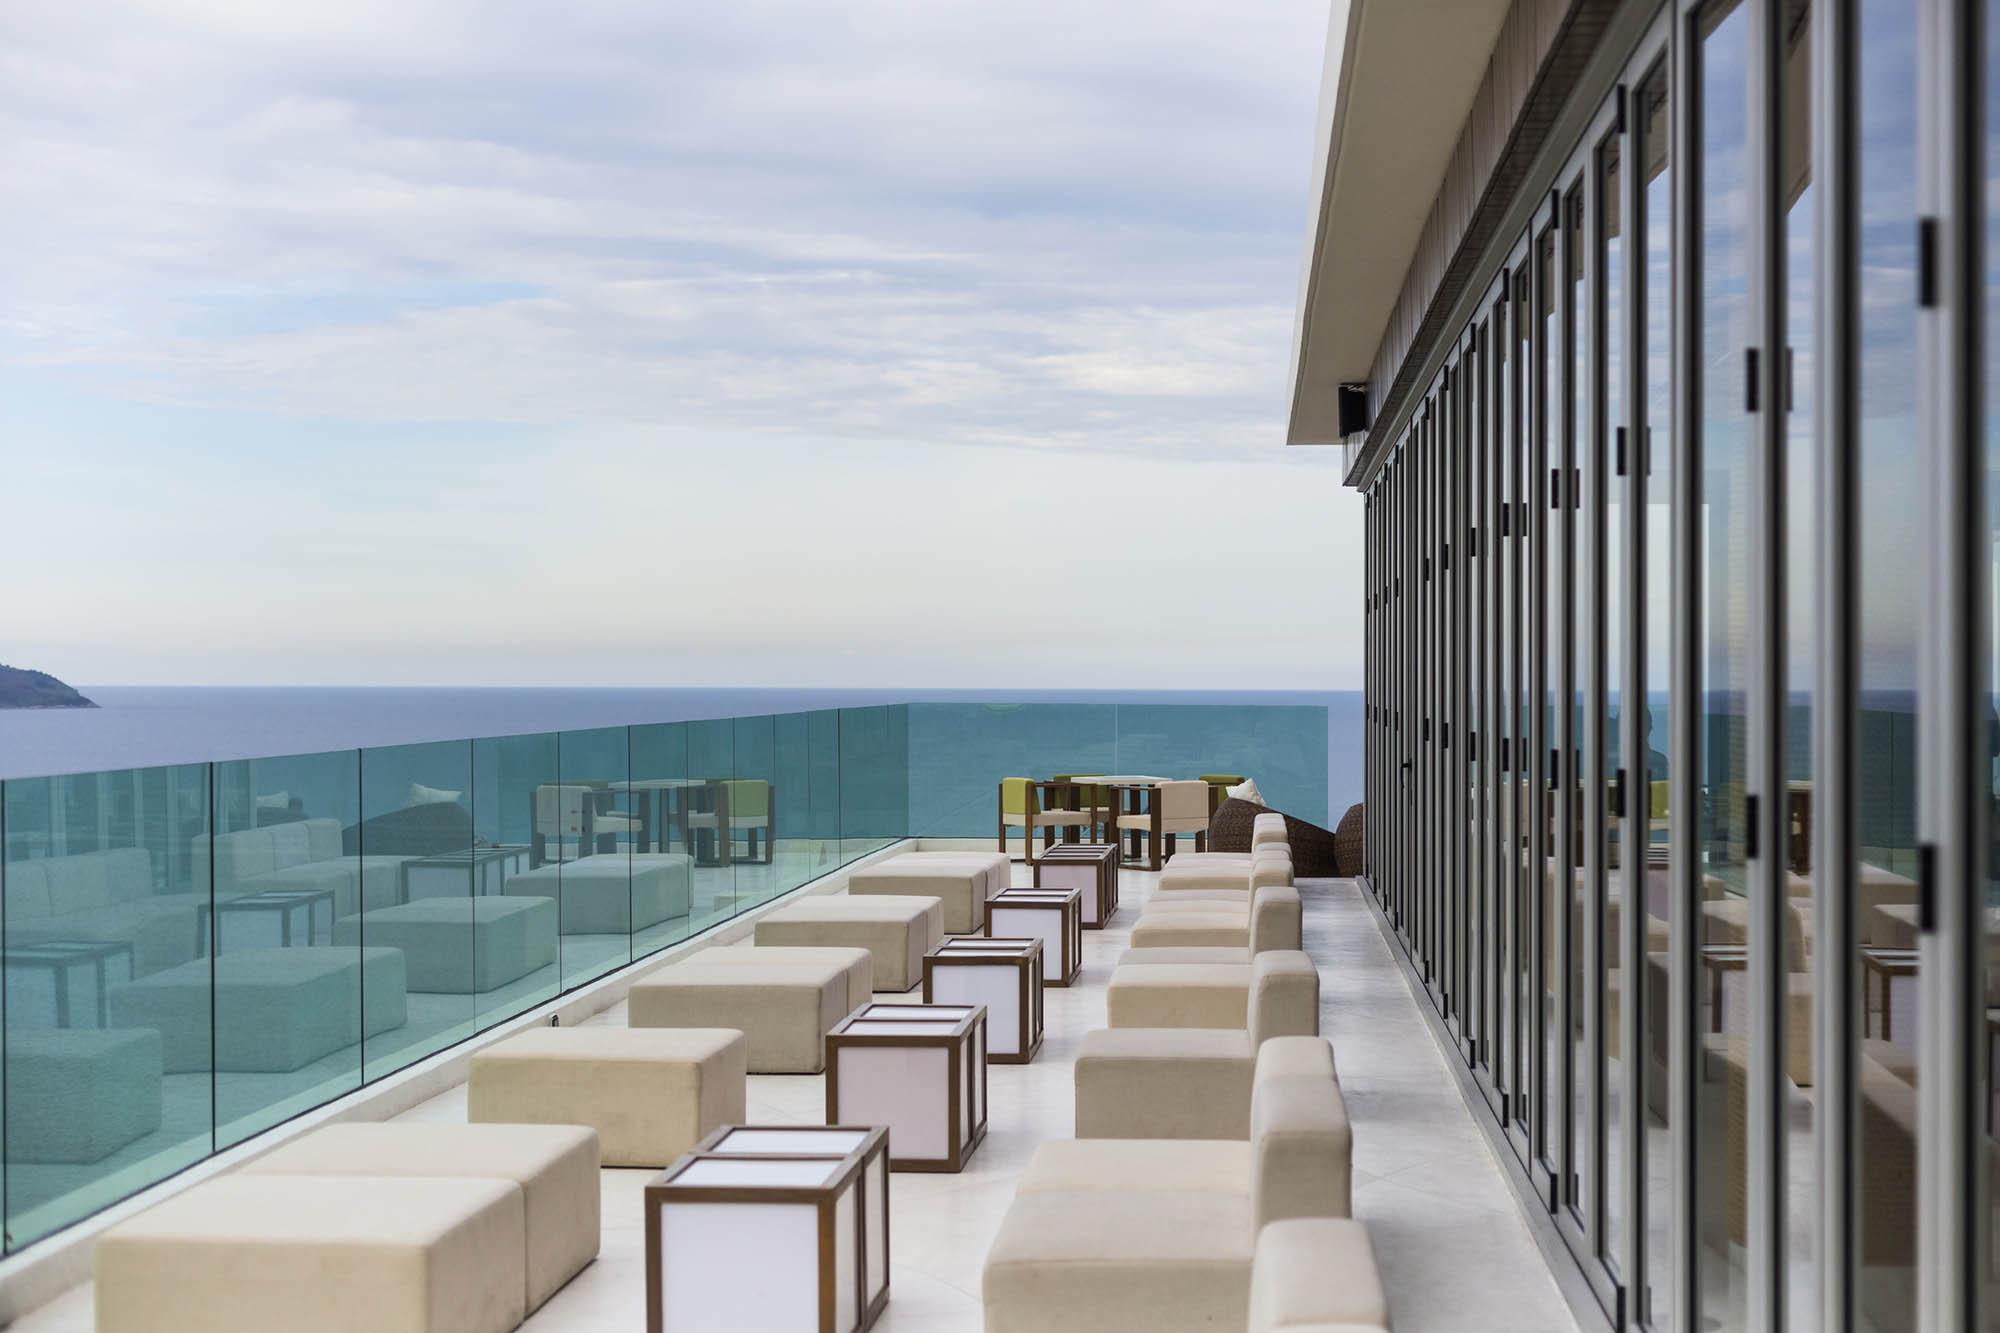 The Top Bar A La Carte Danang Beach Hotel 200 Vo Nguyen Giap Danang Fantasticity Com 02